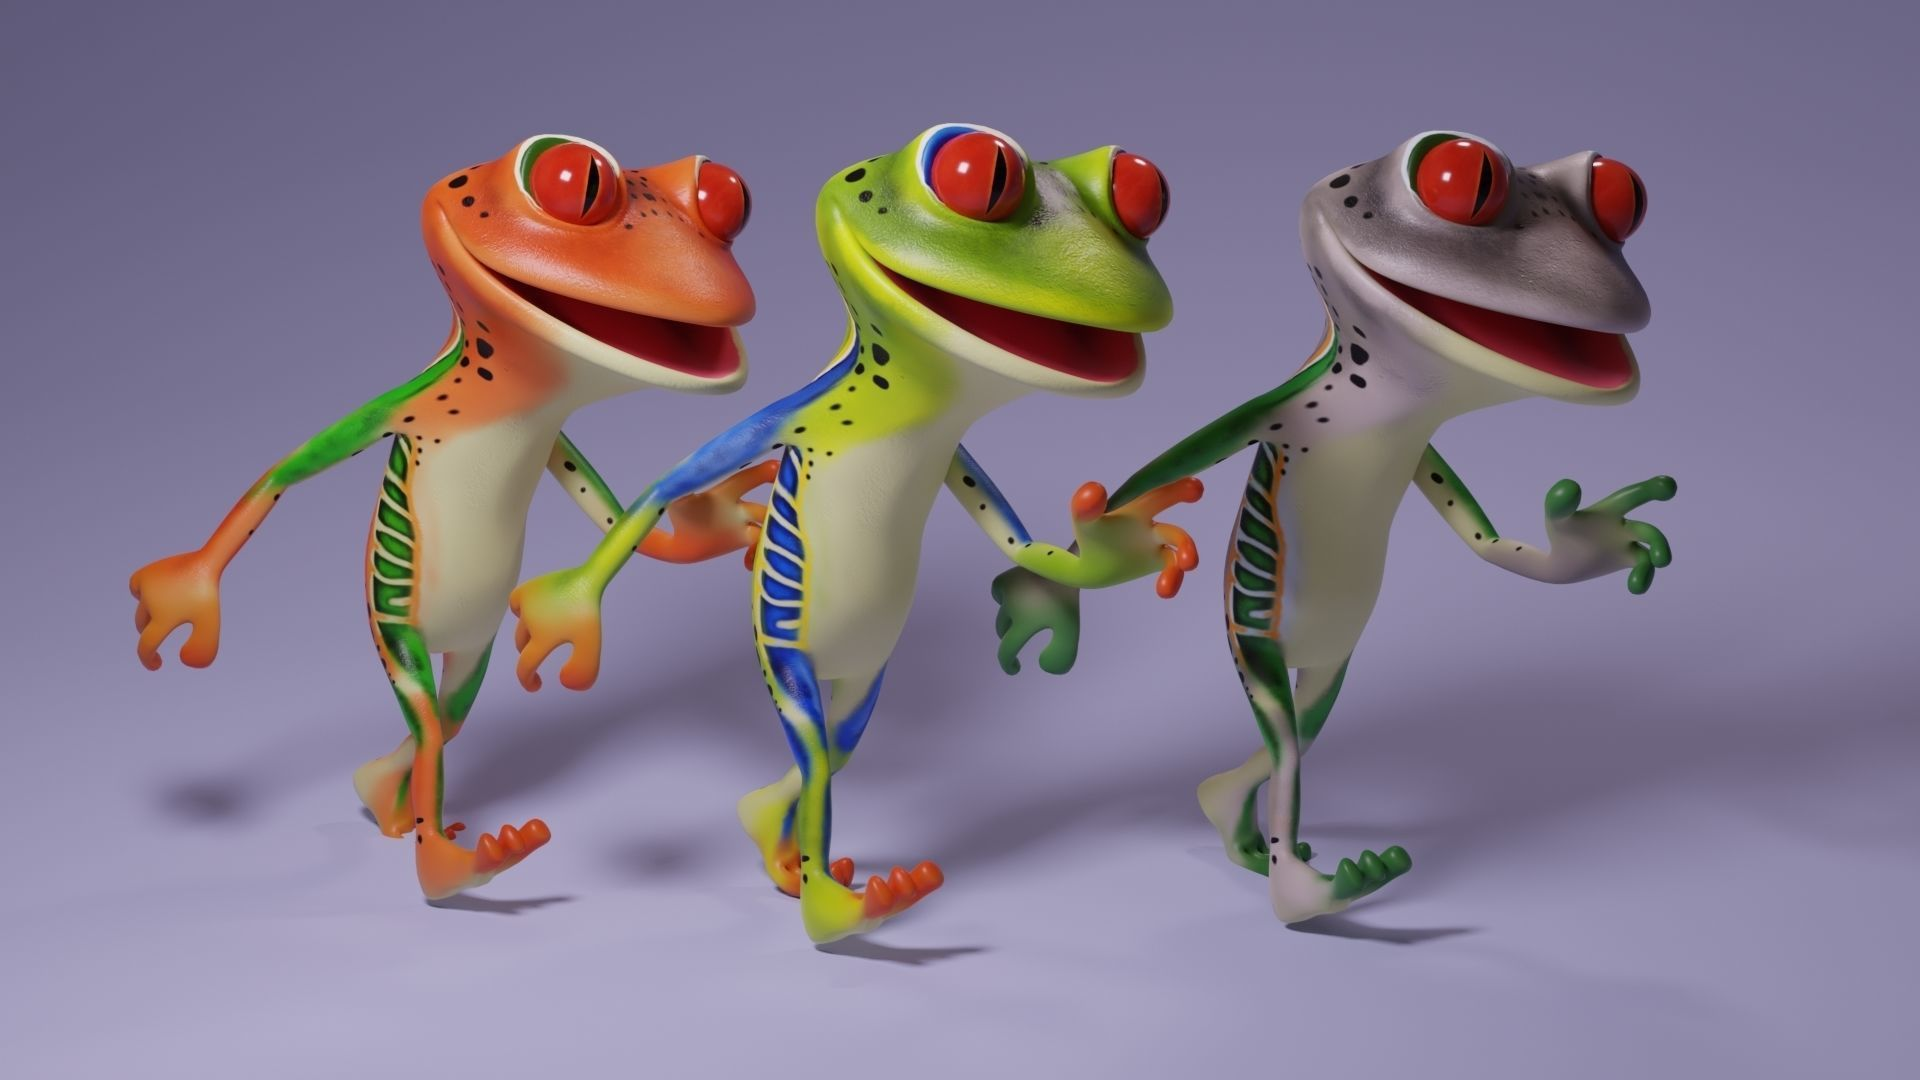 Toon Humanoid Frog